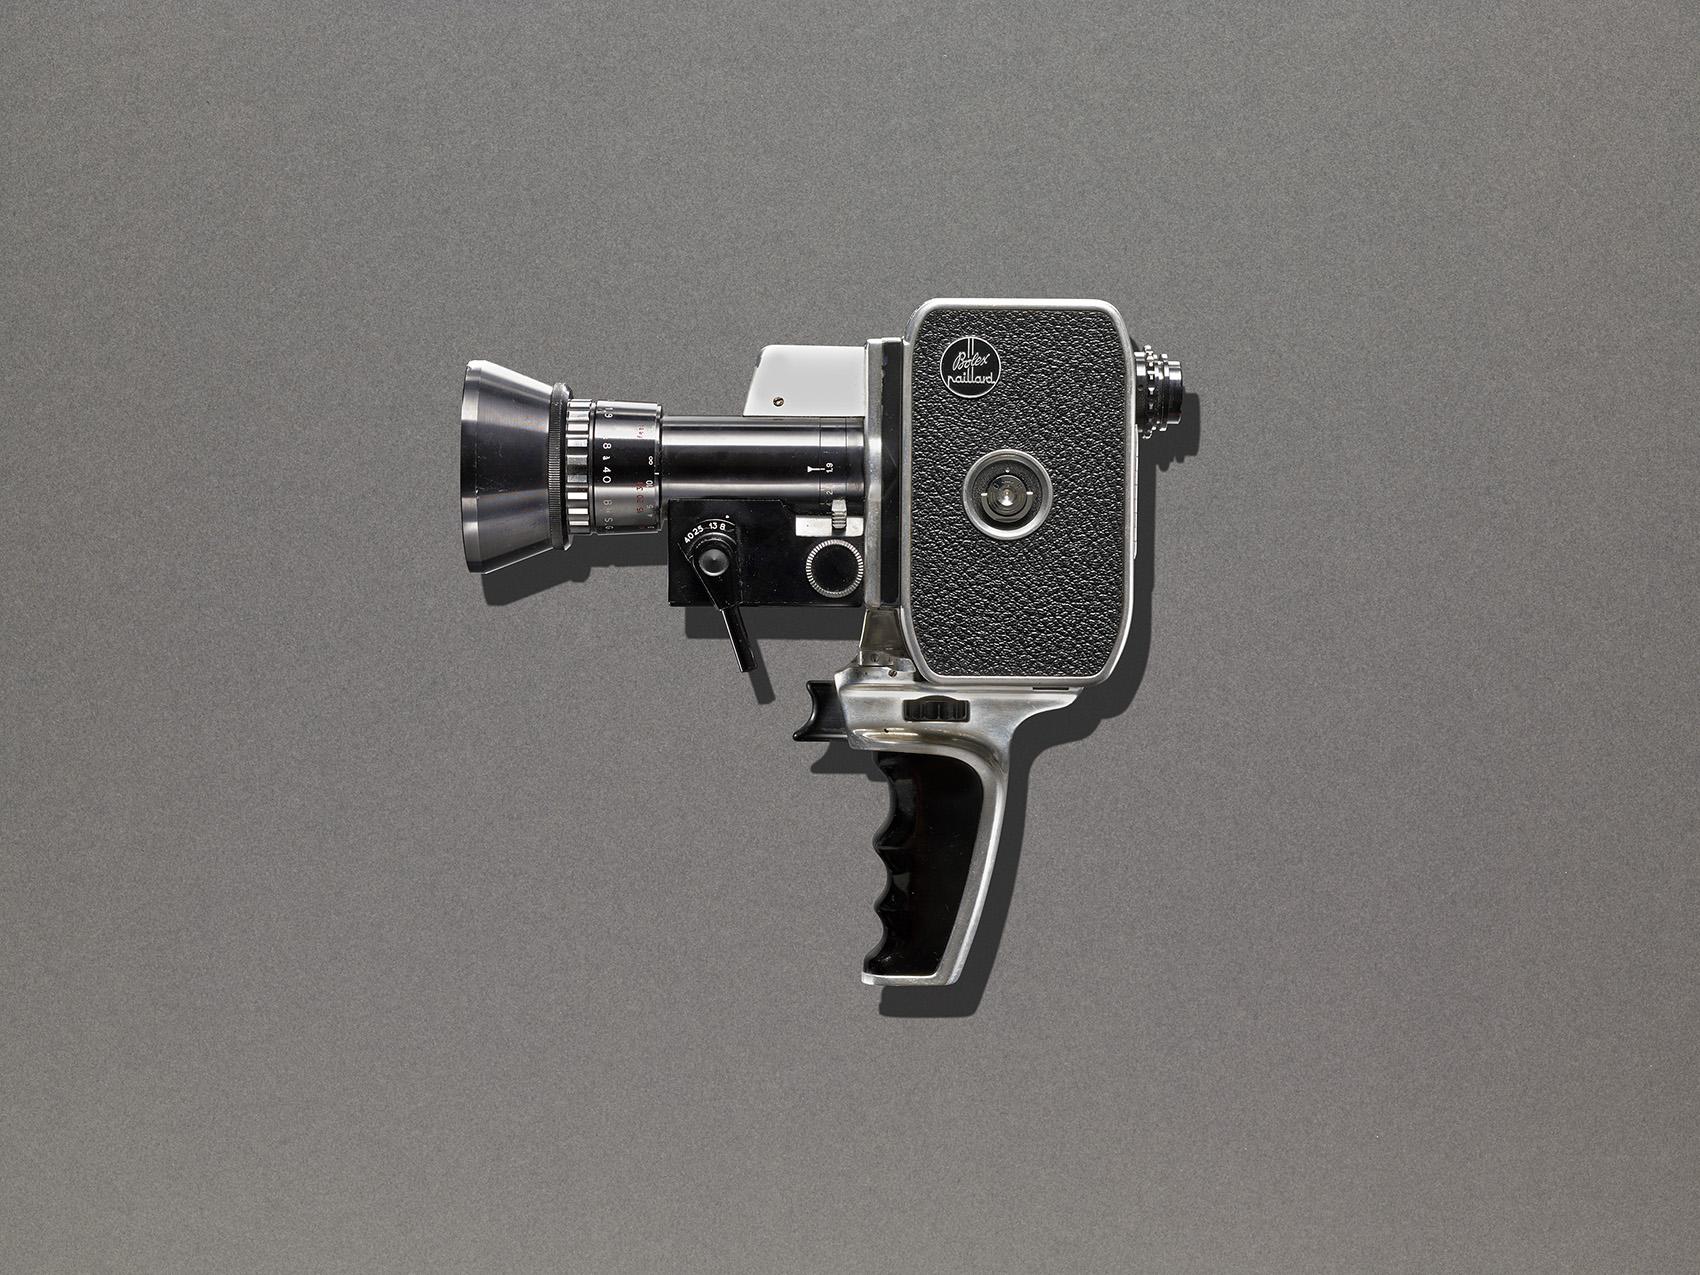 bolex-camera.jpg